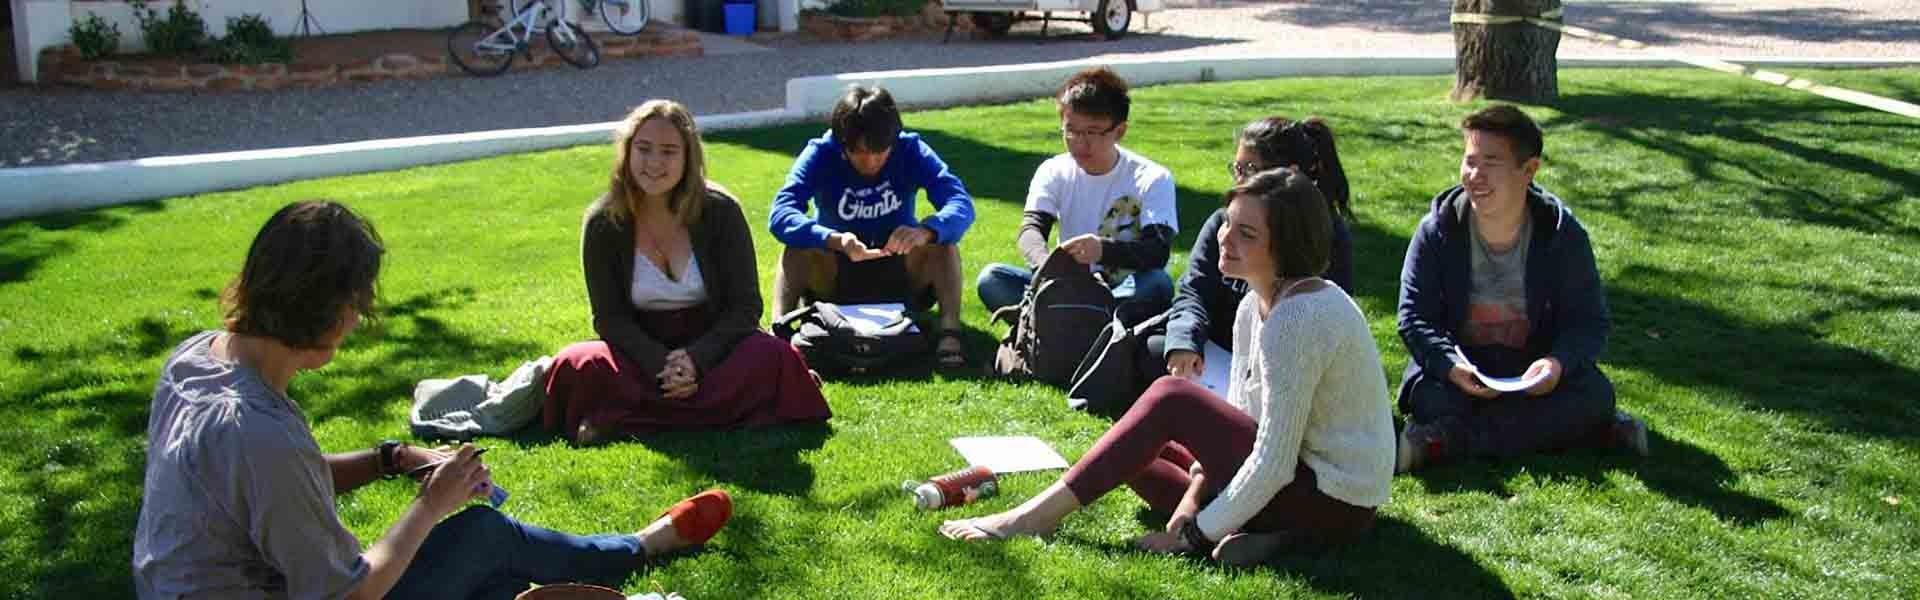 VerdeValleySchool-Highschool-Arizona-Park-MAin-Banner-2019